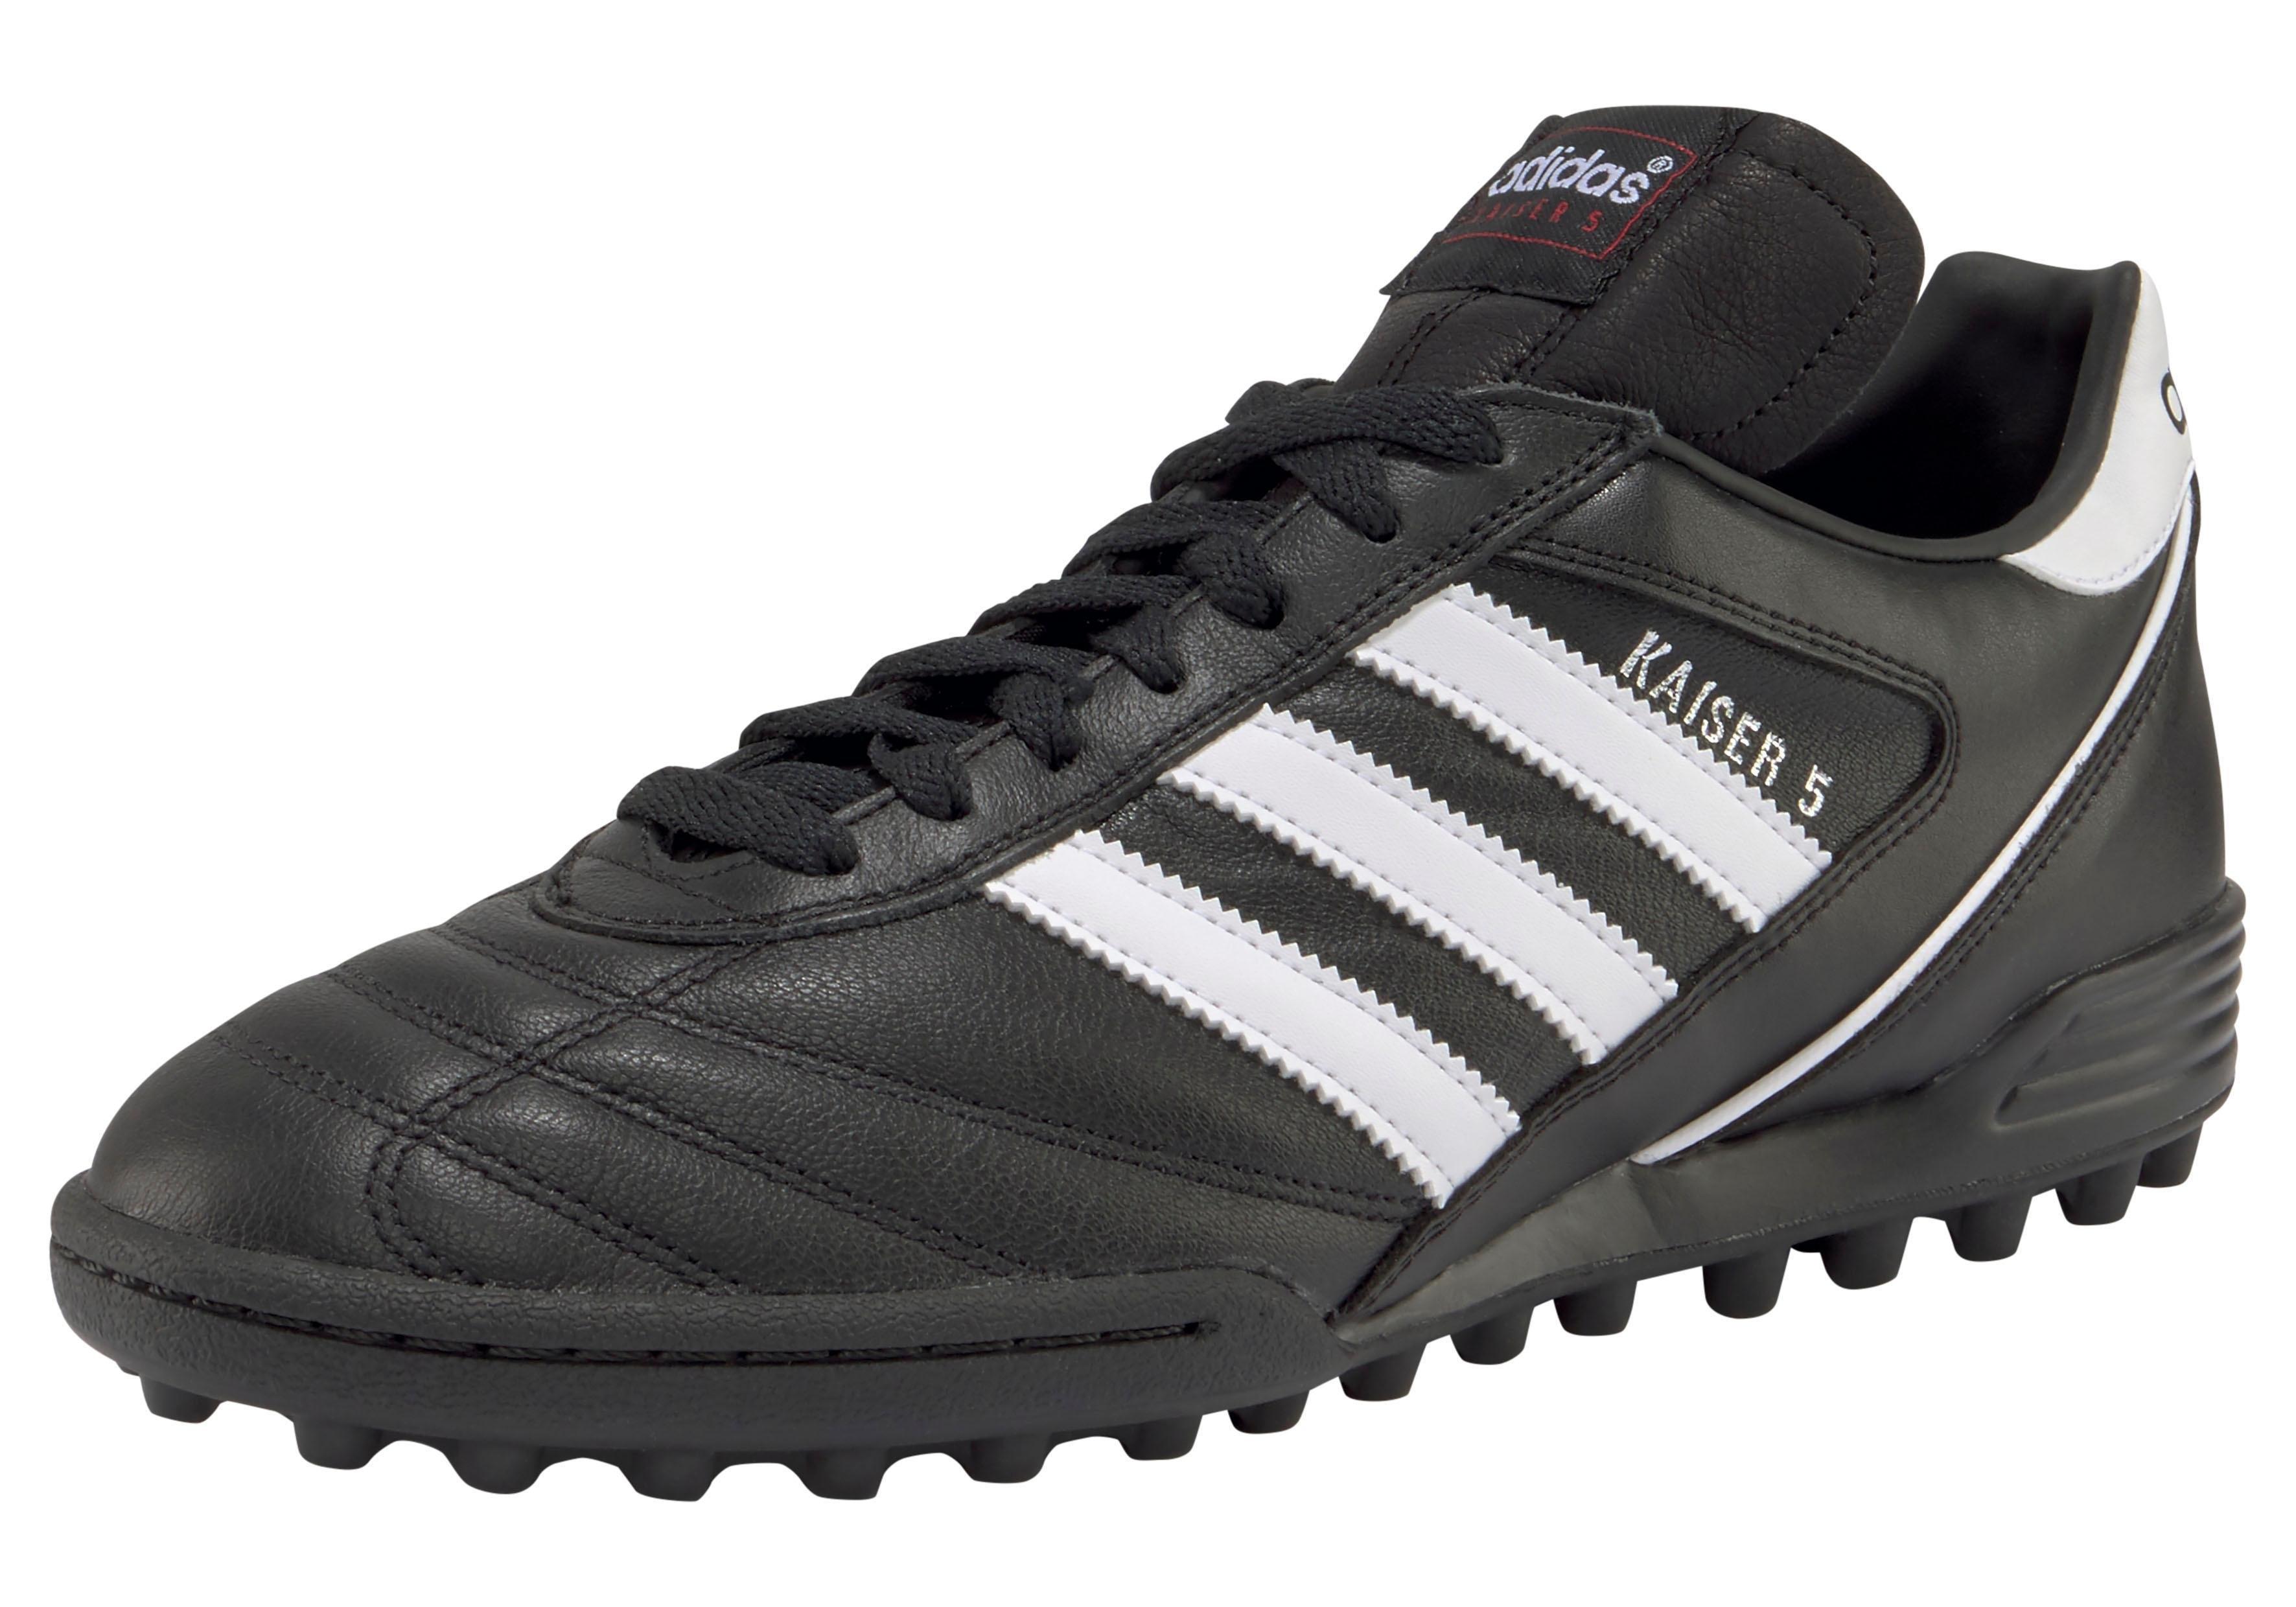 adidas Performance Voetbalschoenen KAISER 5 TEAM nu online kopen bij OTTO